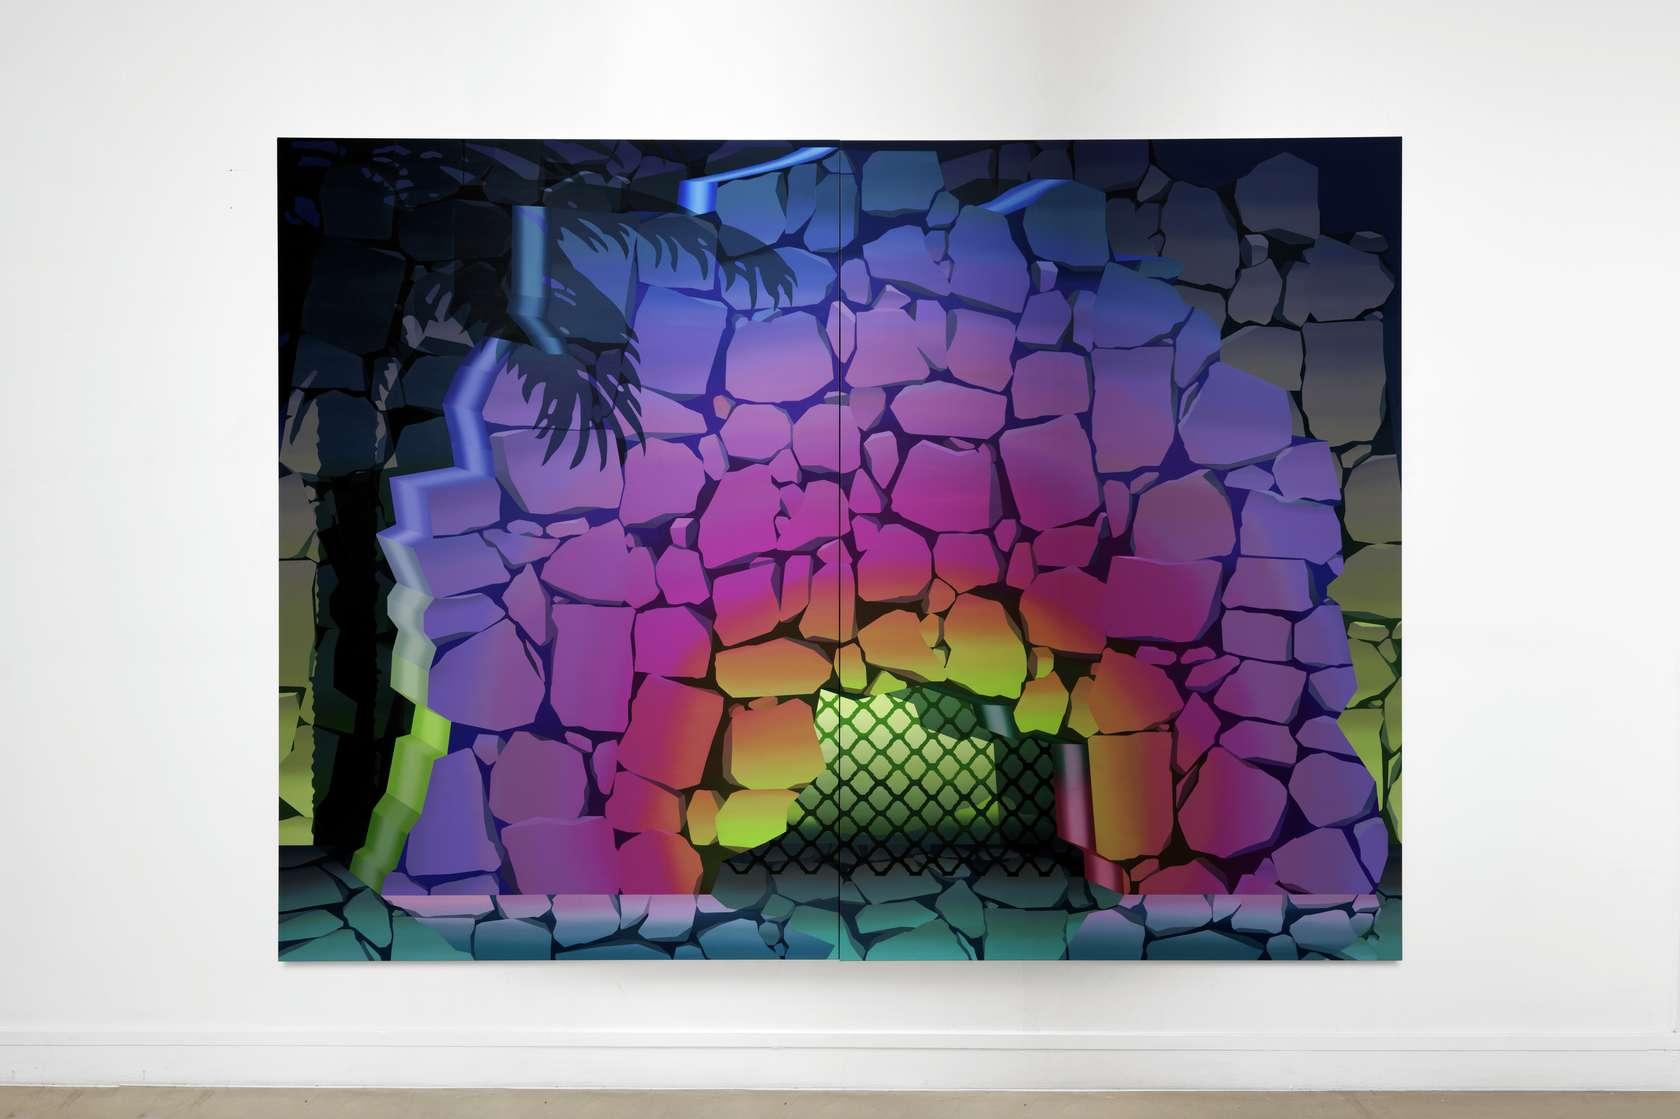 Amélie Bertrand, From Dusk Till Dawn, 2019 Huile sur toile (diptyque)220 × 300 × 4.5 cm / 86 5/8 × 118 1/8 × 17 6/8 in.220 × 150 × 4.5 cm / 86 5/8 × 59  × 1 6/8 in. (chaque/each)